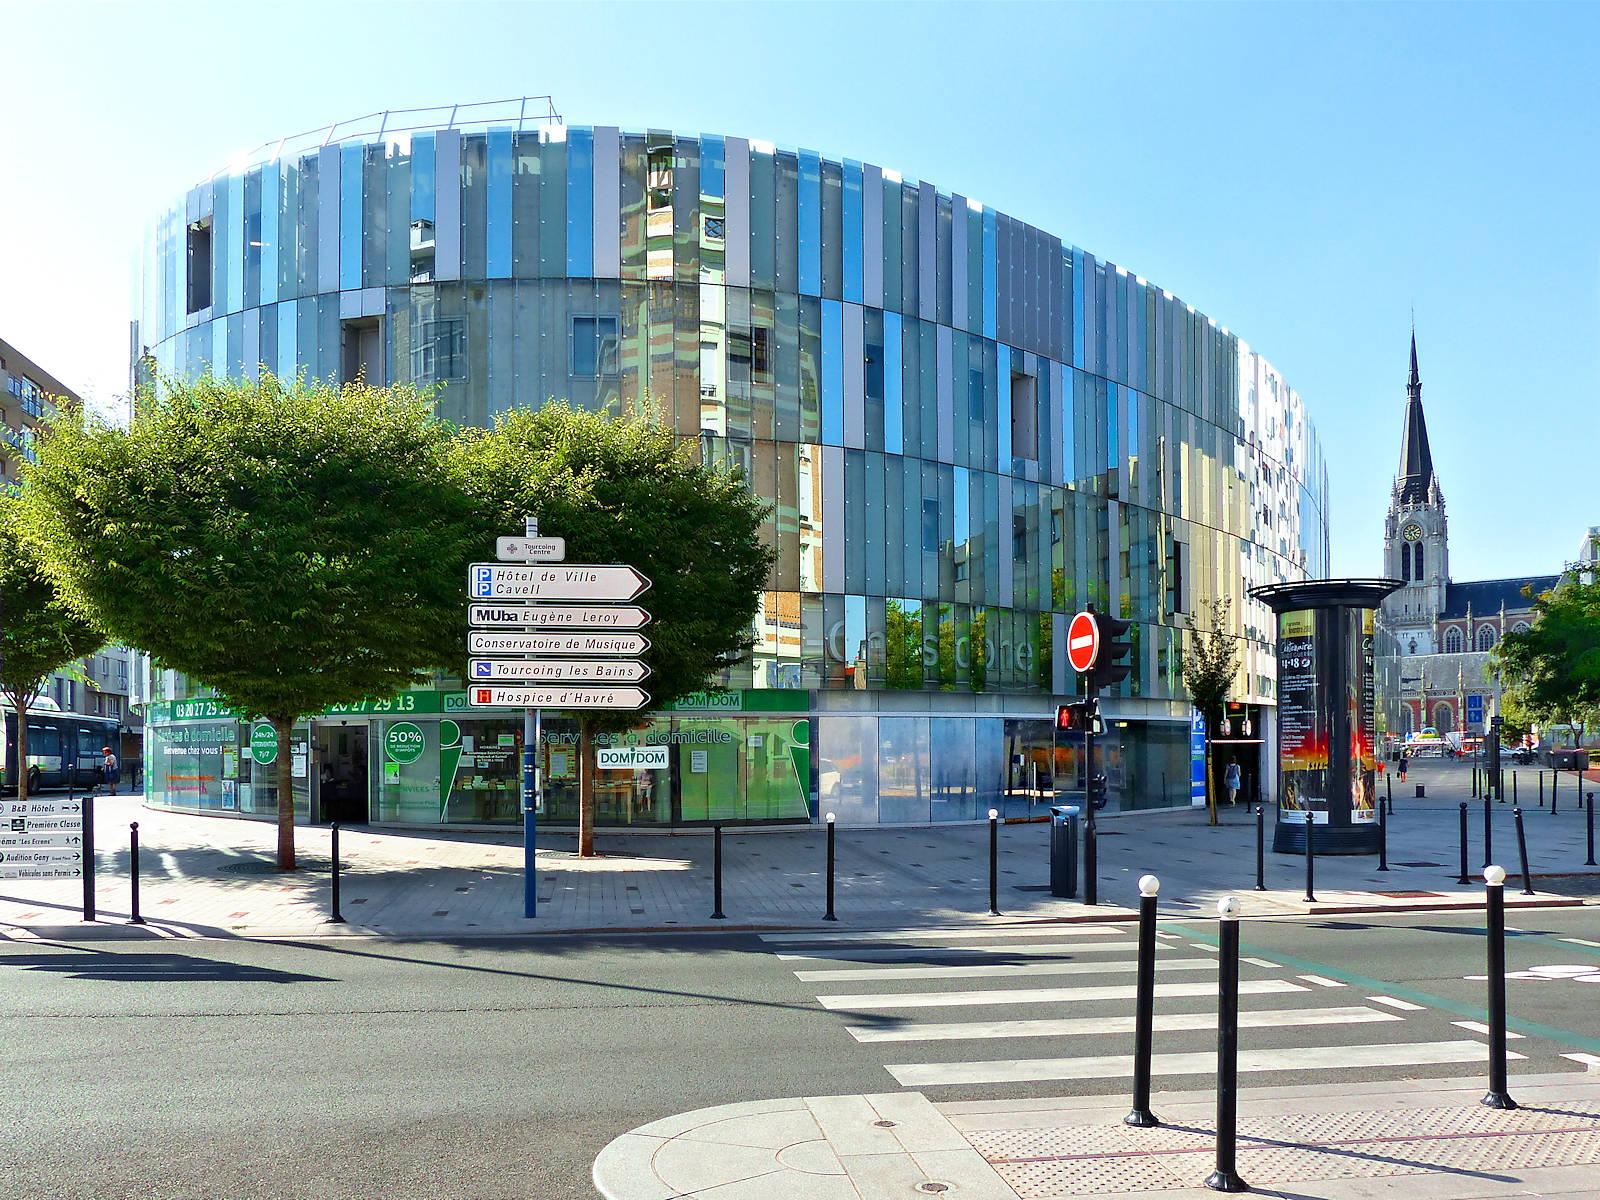 Espace Saint Christophe, Tourcoing - Domidom